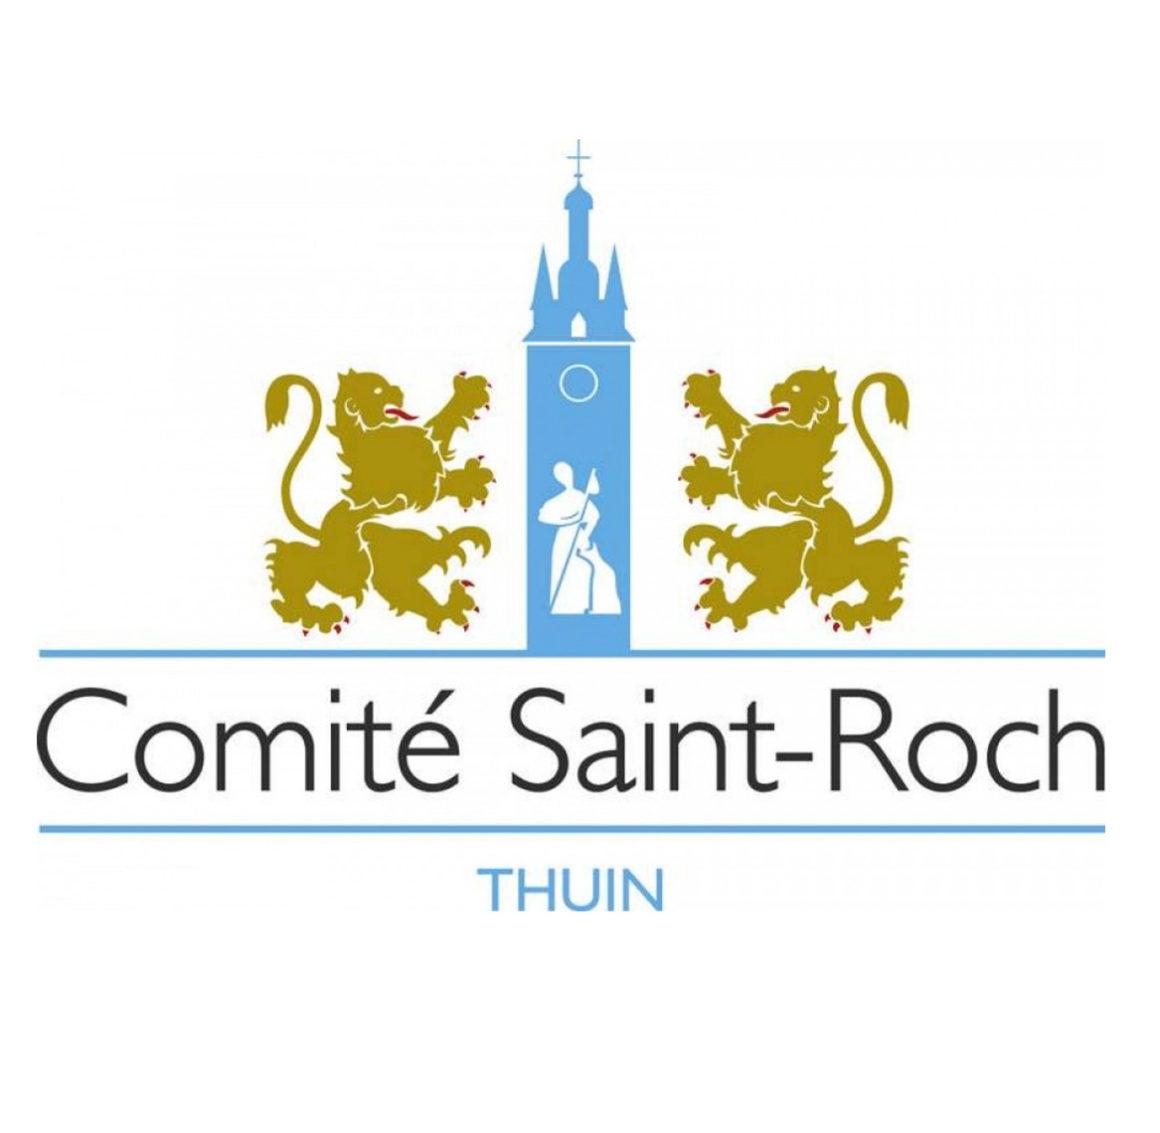 Comité Saint-Roch Thuin